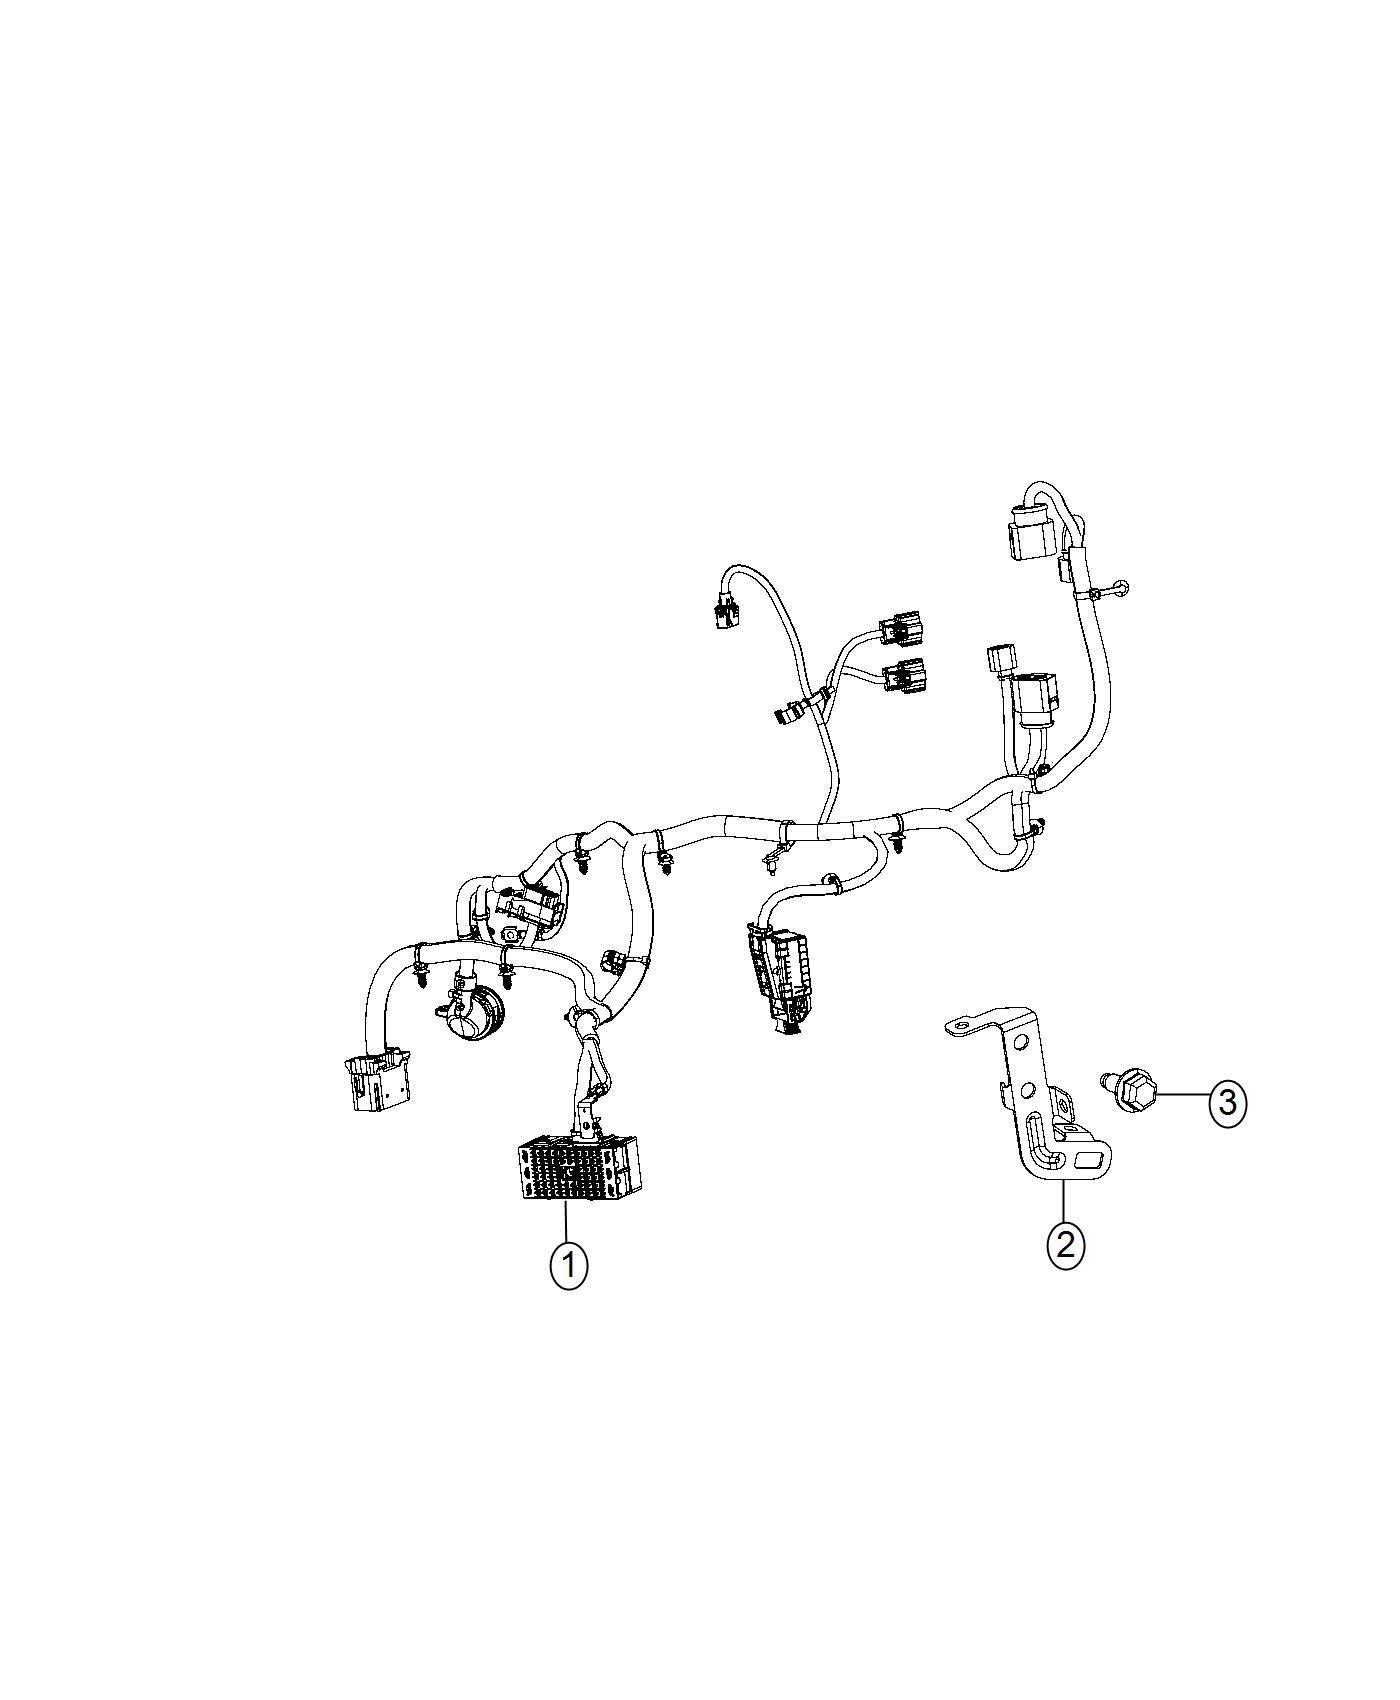 2017 Jeep Cherokee Screw. Hex flange head. Ground, module